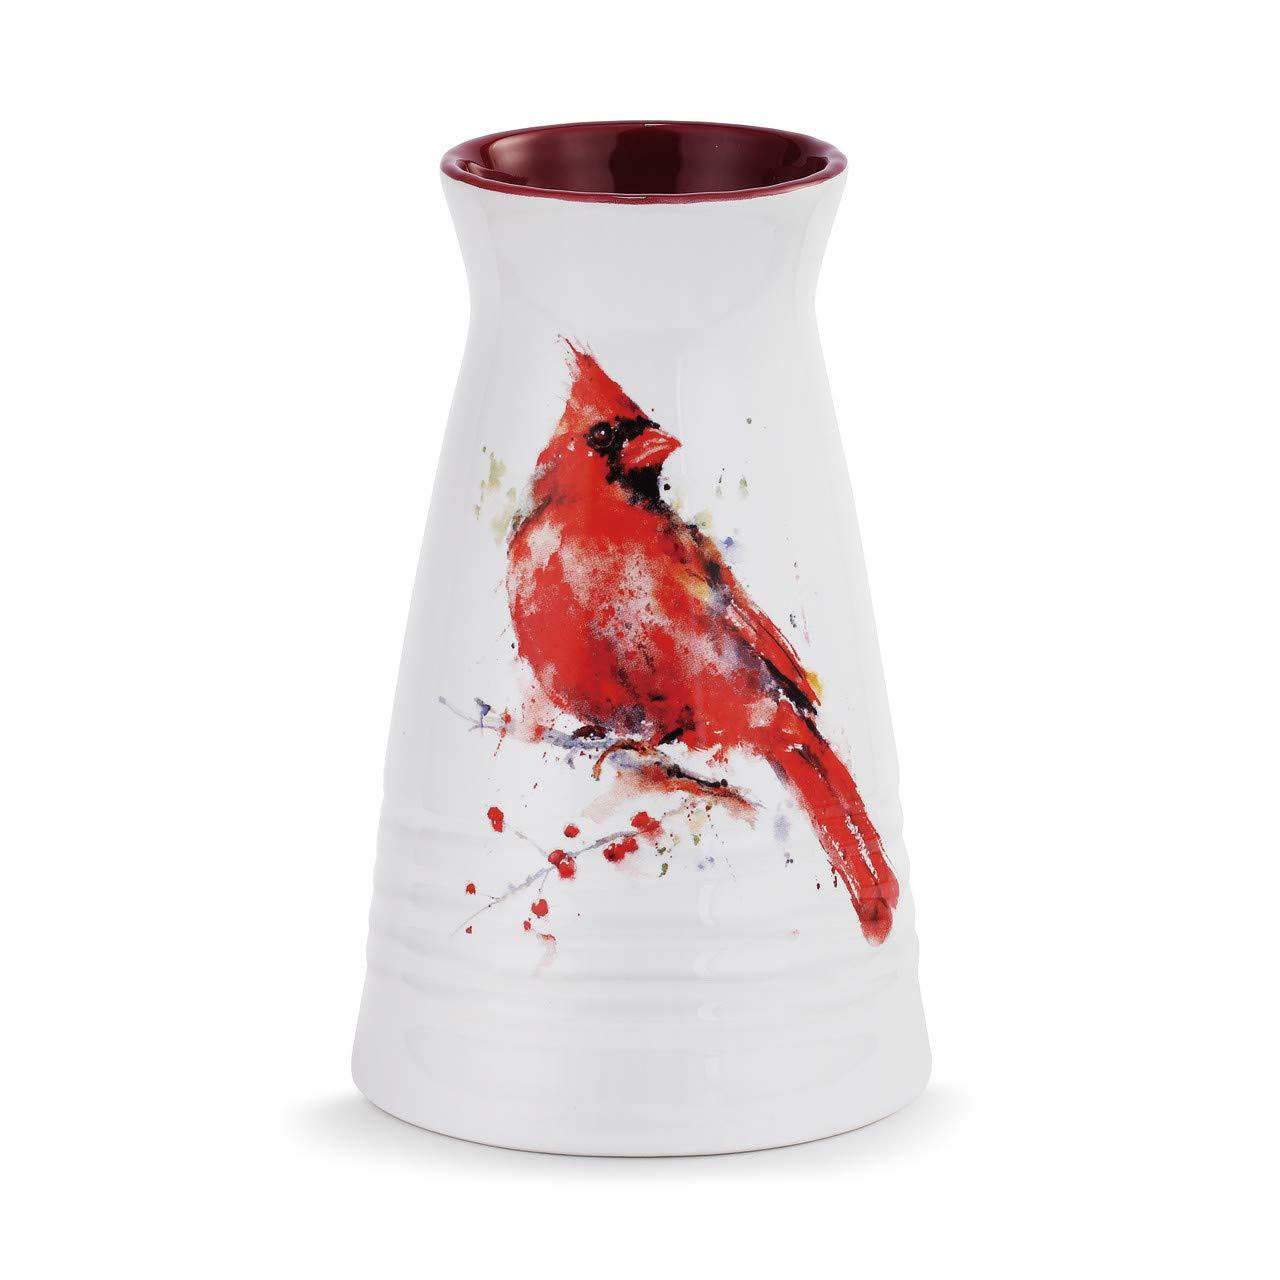 Demdaco Dean Crouser Redhead Cardinal Bird Watercolor Red 7 x 5 Glossy Ceramic Stoneware Vase